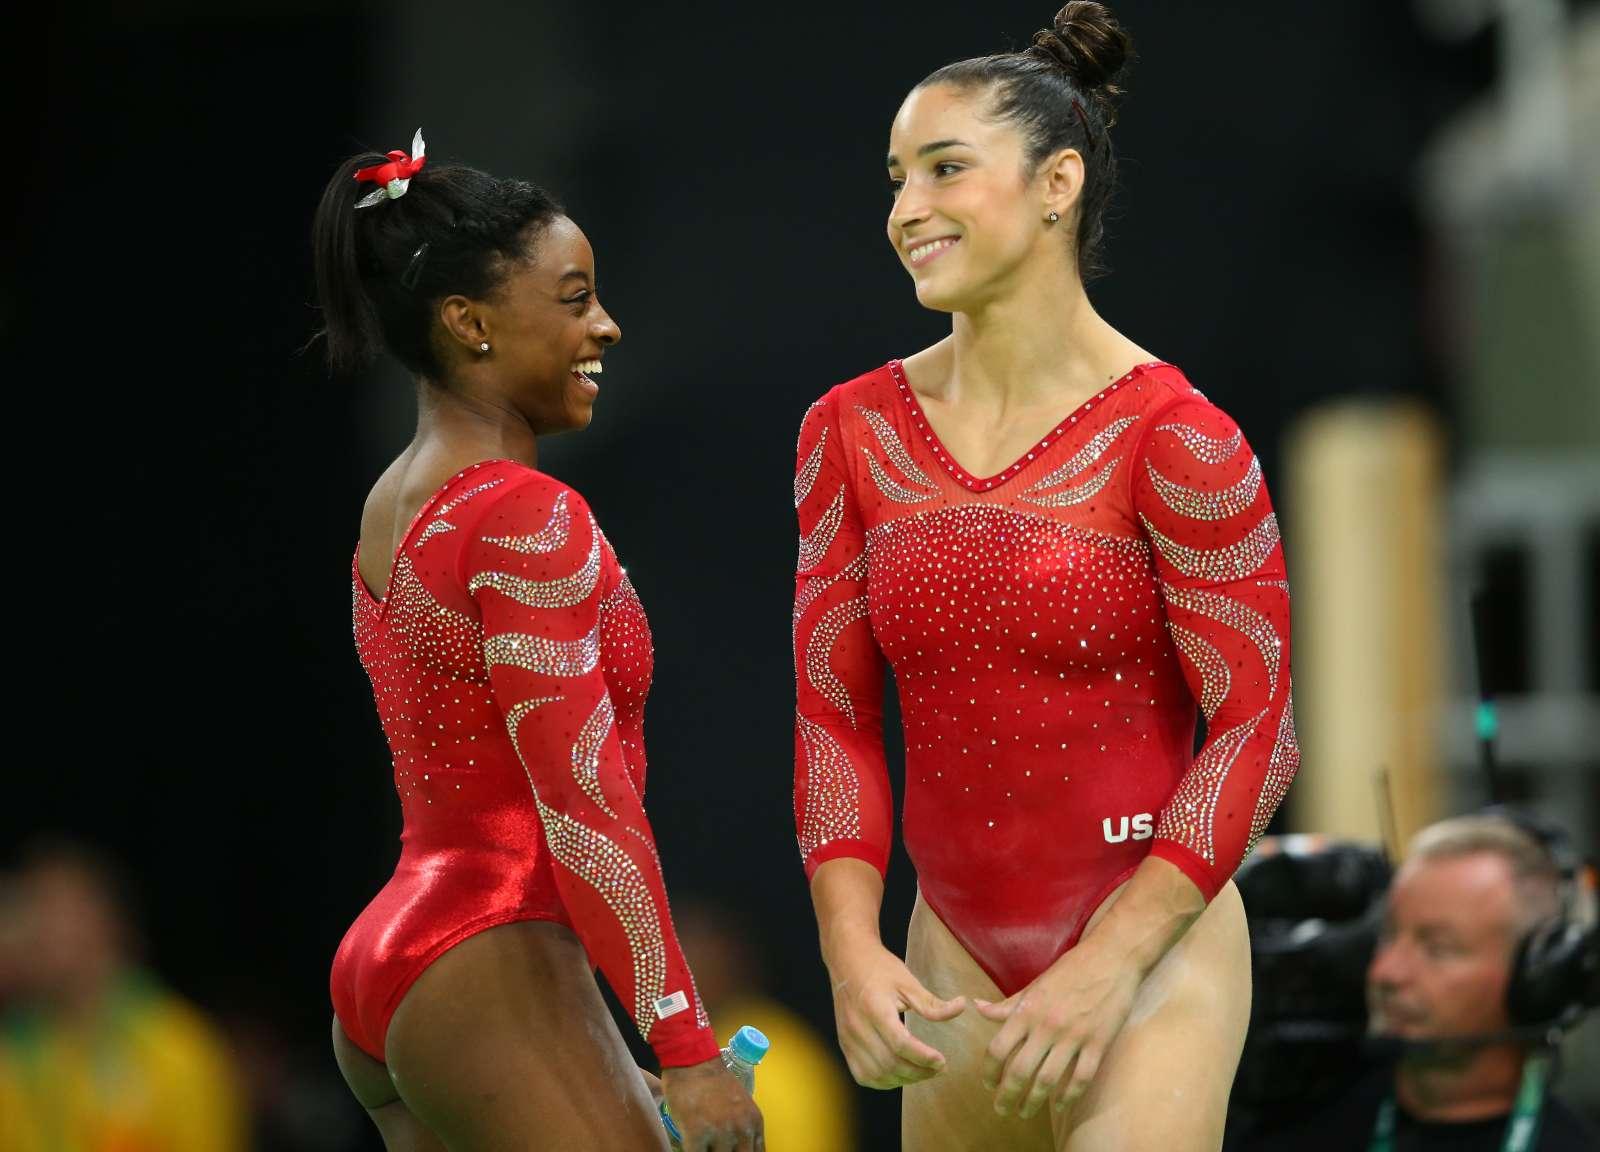 Aly Raisman - Rio 2016 Olympics Games: Podium Training